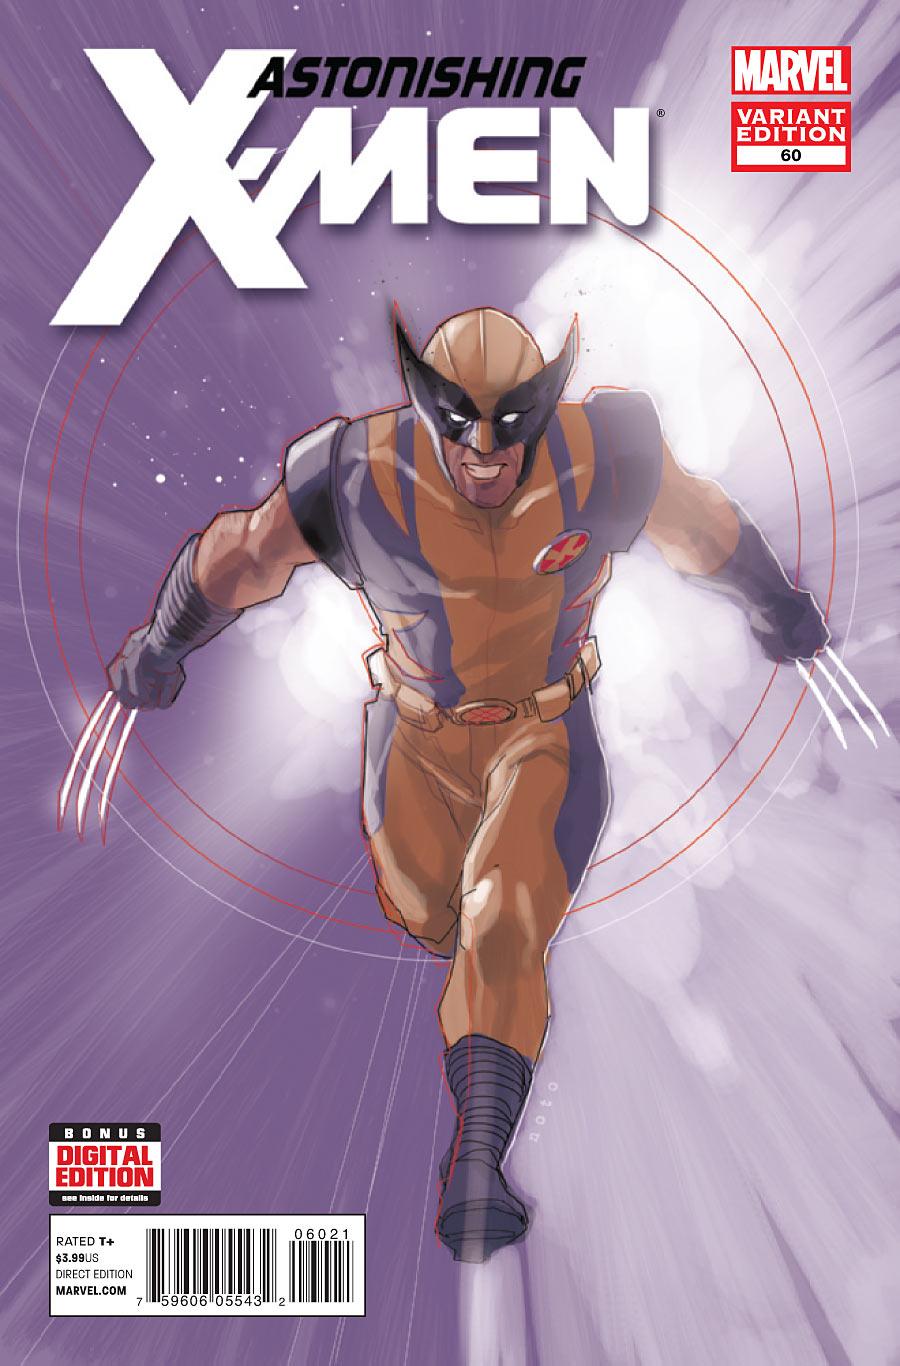 Astonishing X-Men Vol 3 60 Phil Noto Variant.jpg